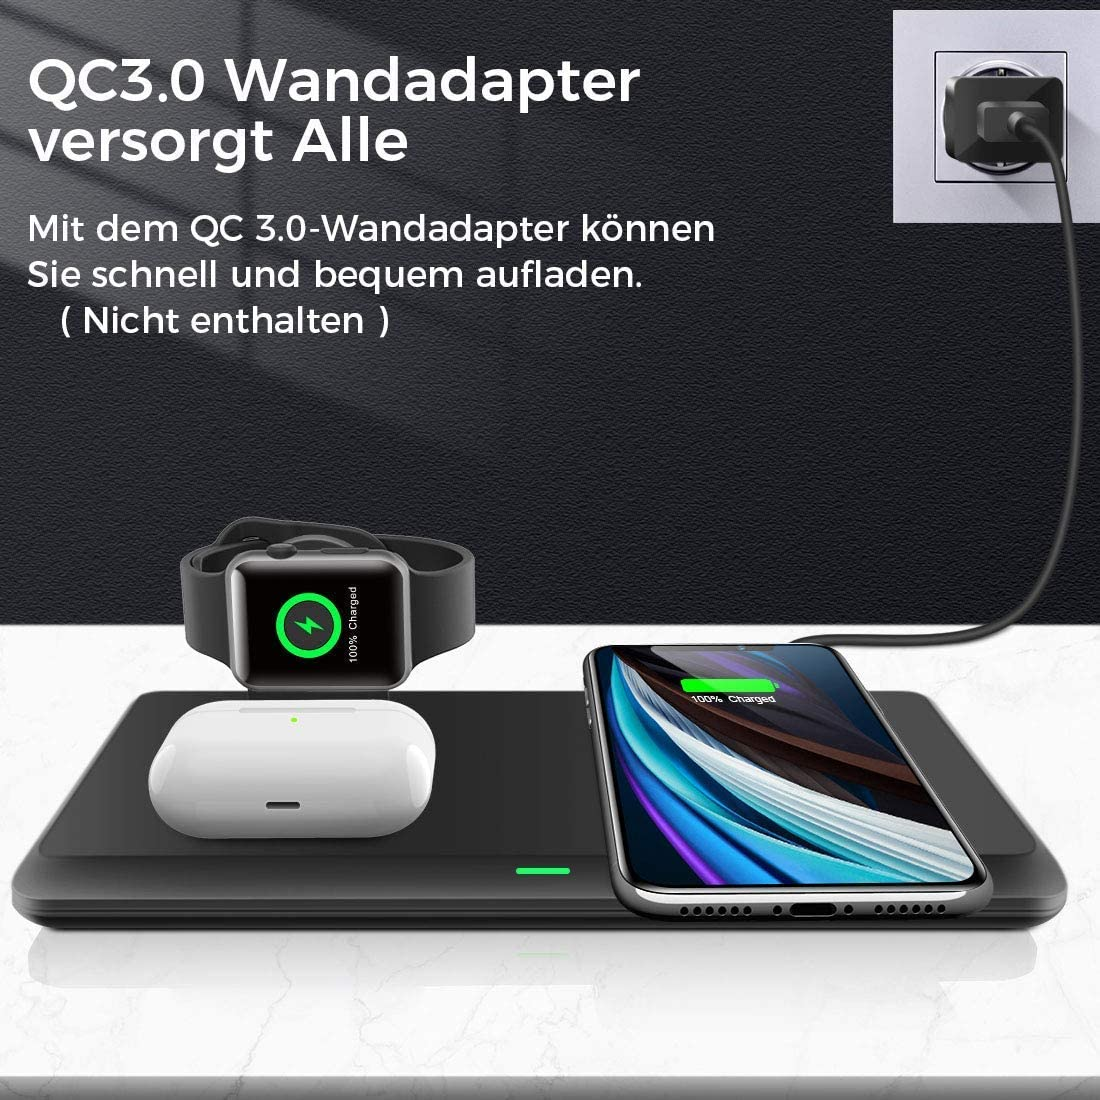 Estaci/ón de Carga Inal/ámbrica para iPhone SE(2020)//11 Pro//11 Pro Max//XR//XS//X//8 Samsung Galaxy S20//S10 3 en 1 Soportes de Carga Inal/ámbrico para Apple Watch Cargador Inal/ámbrico R/ápido AirPods Pro